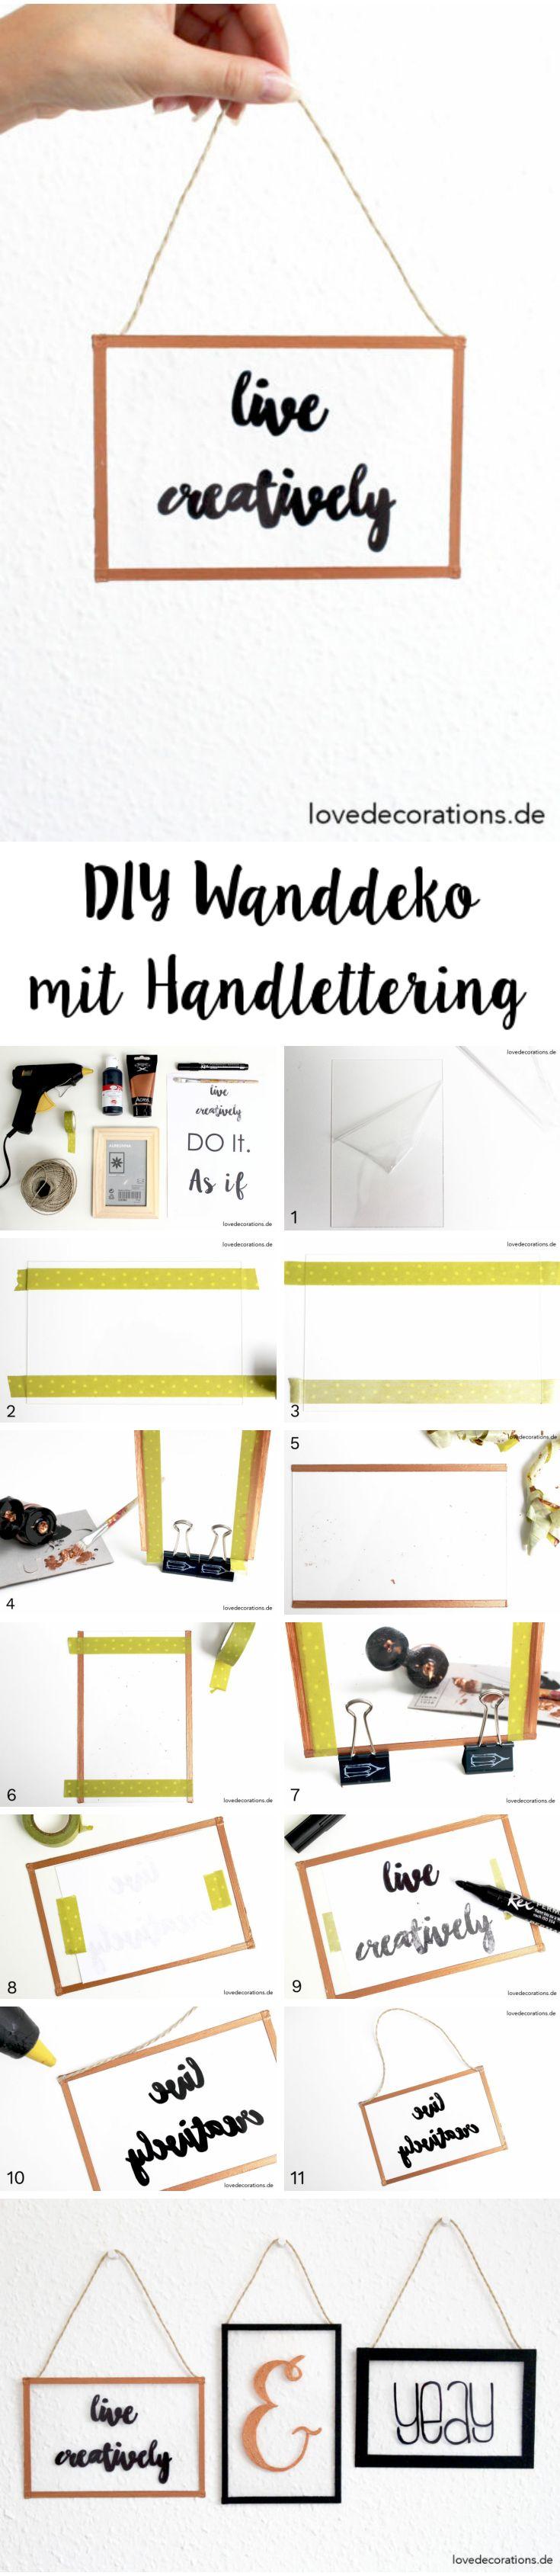 115 best DIY Handlettering images on Pinterest | Calligraphy ...